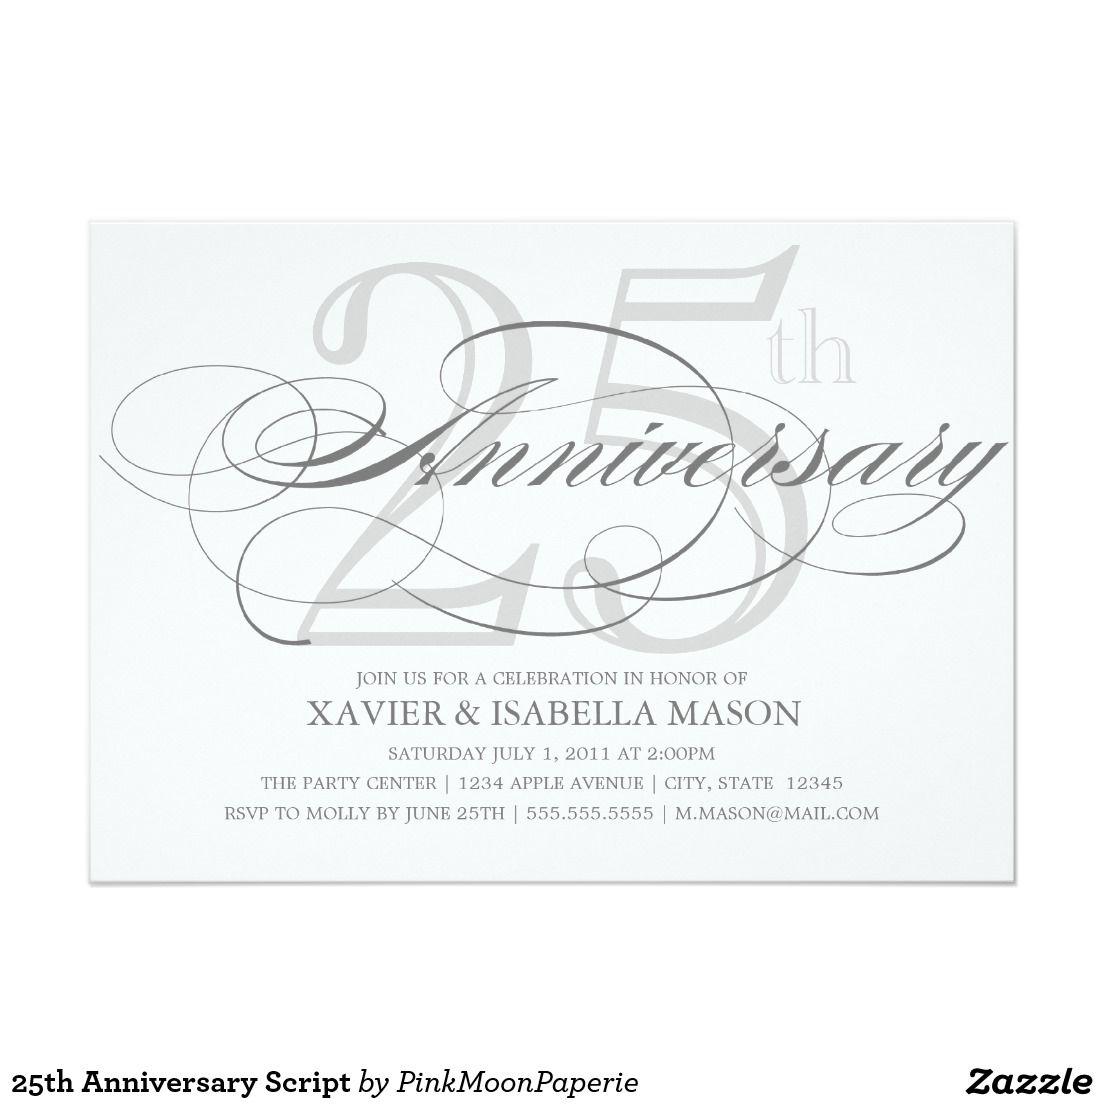 25th Anniversary Script Card | Silver wedding invitations and Weddings